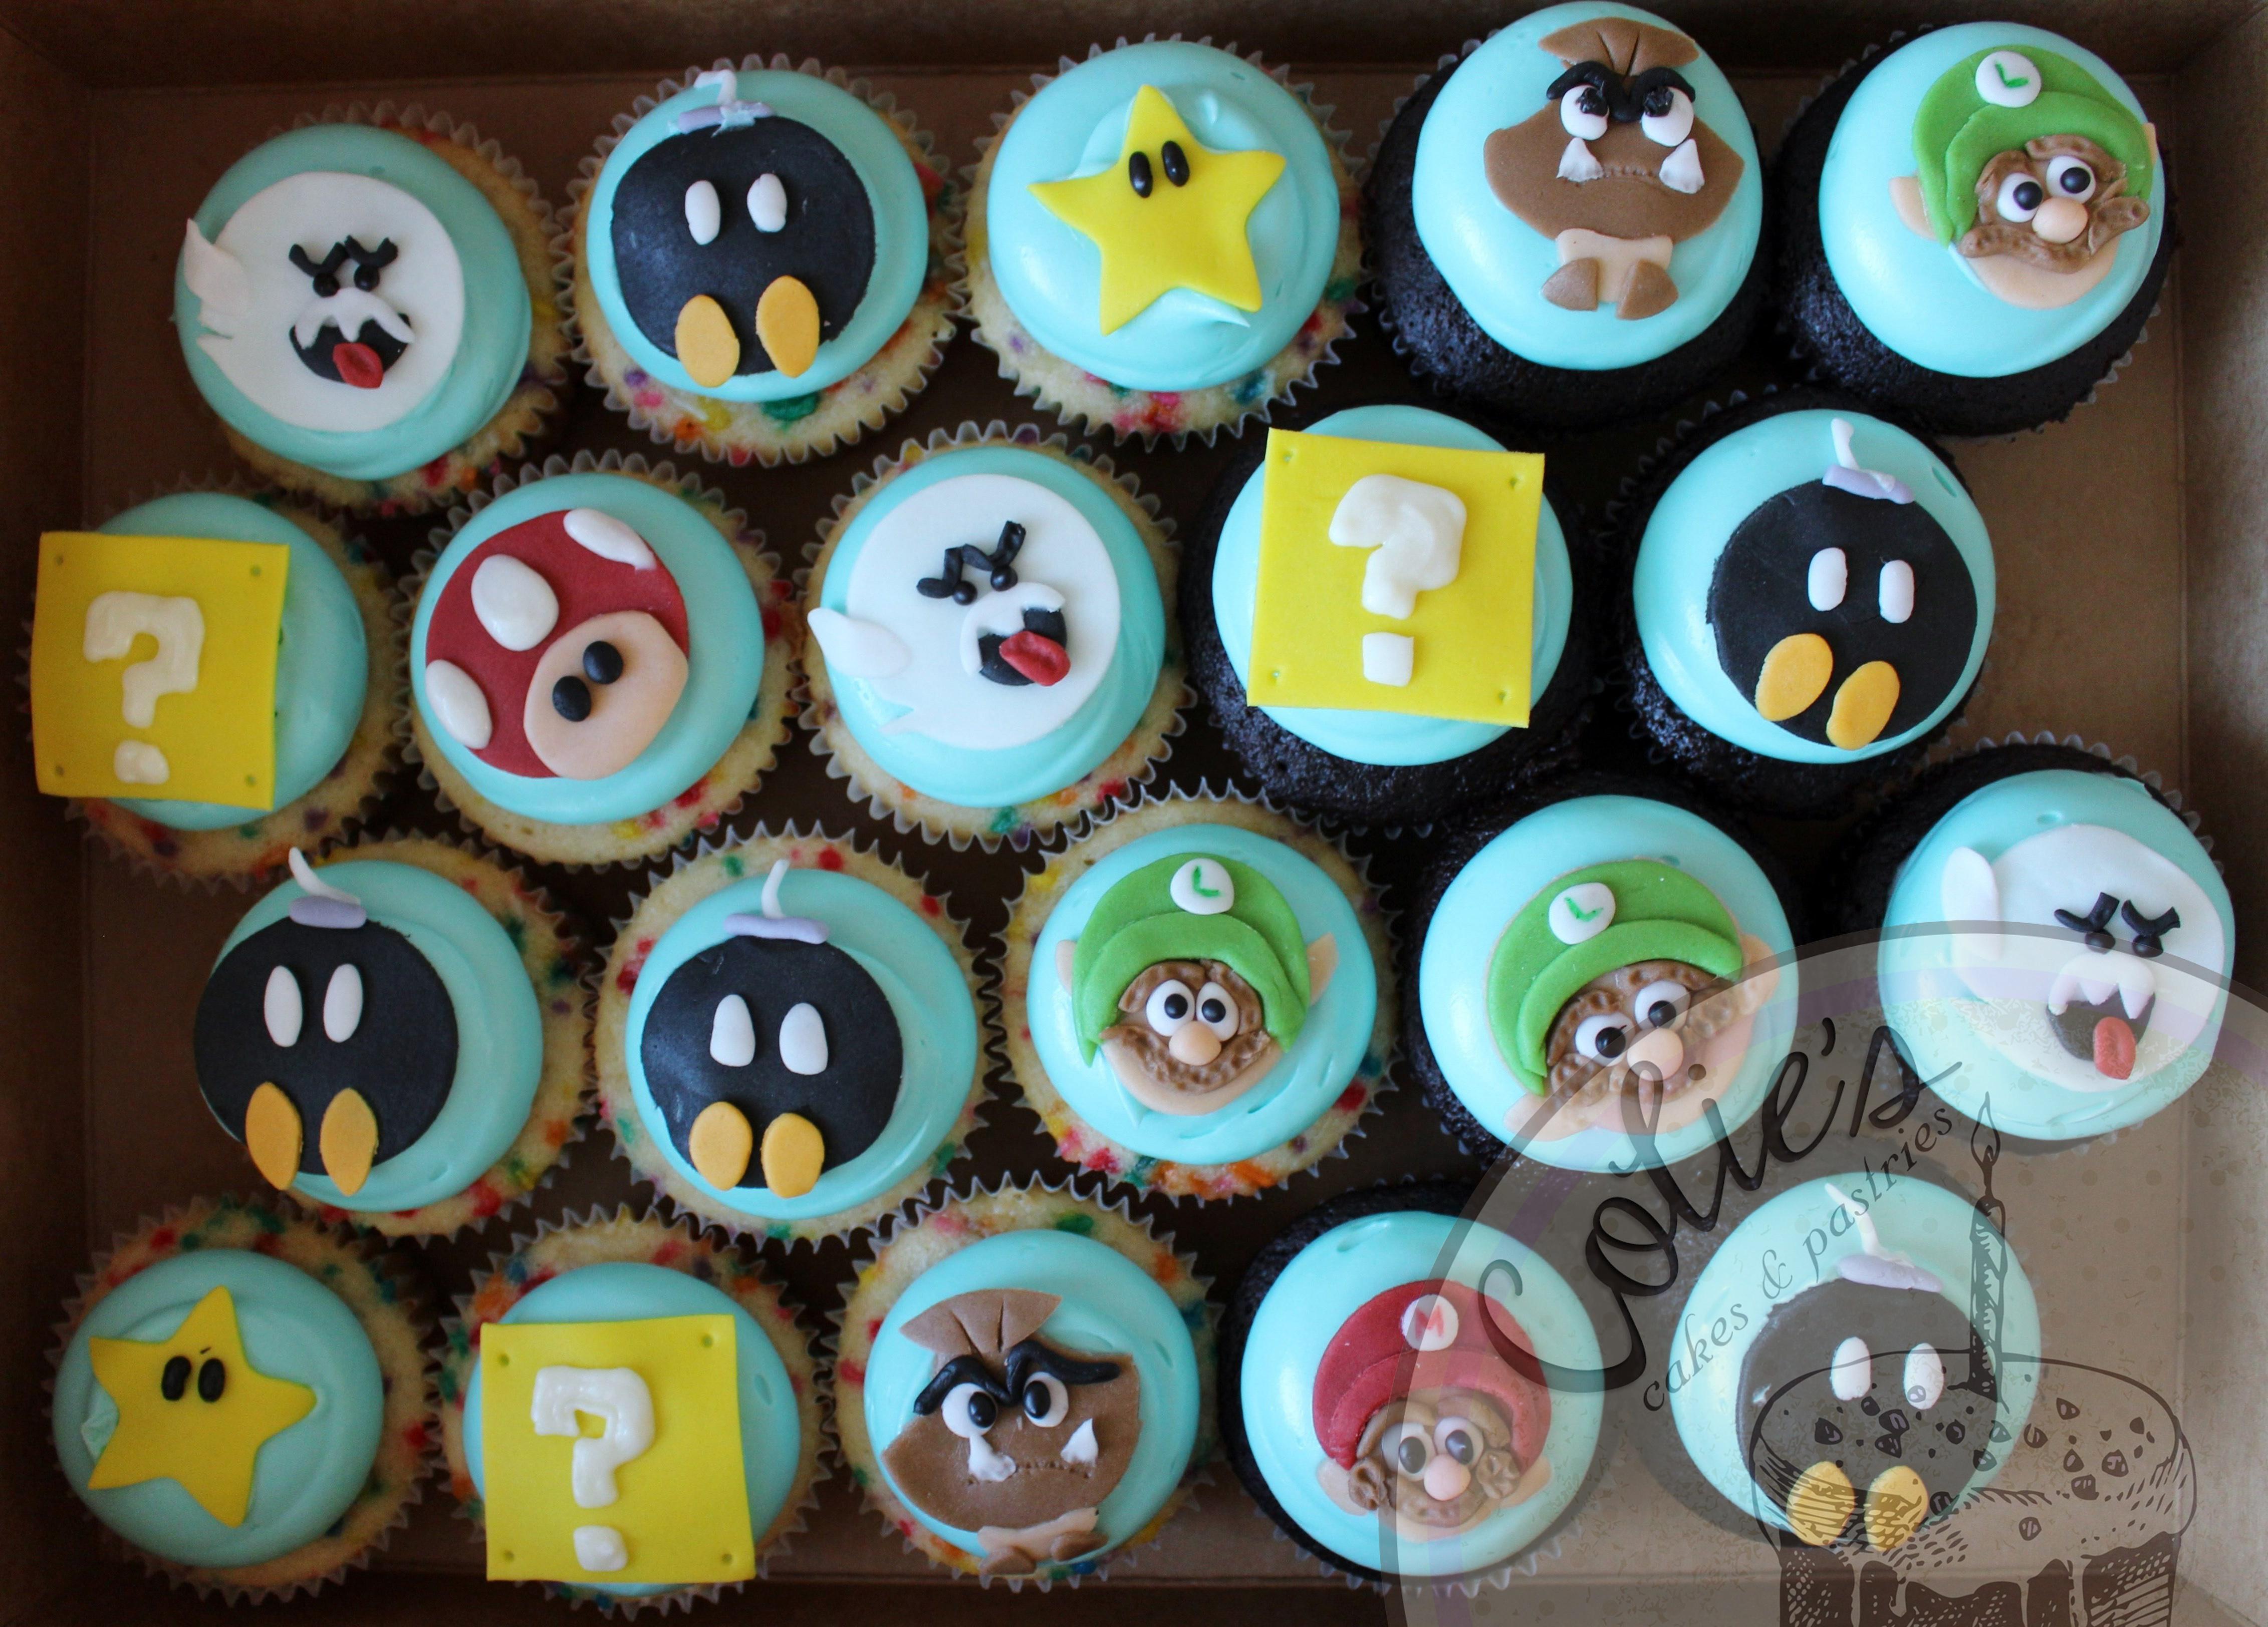 Mario Brother's cupcakes